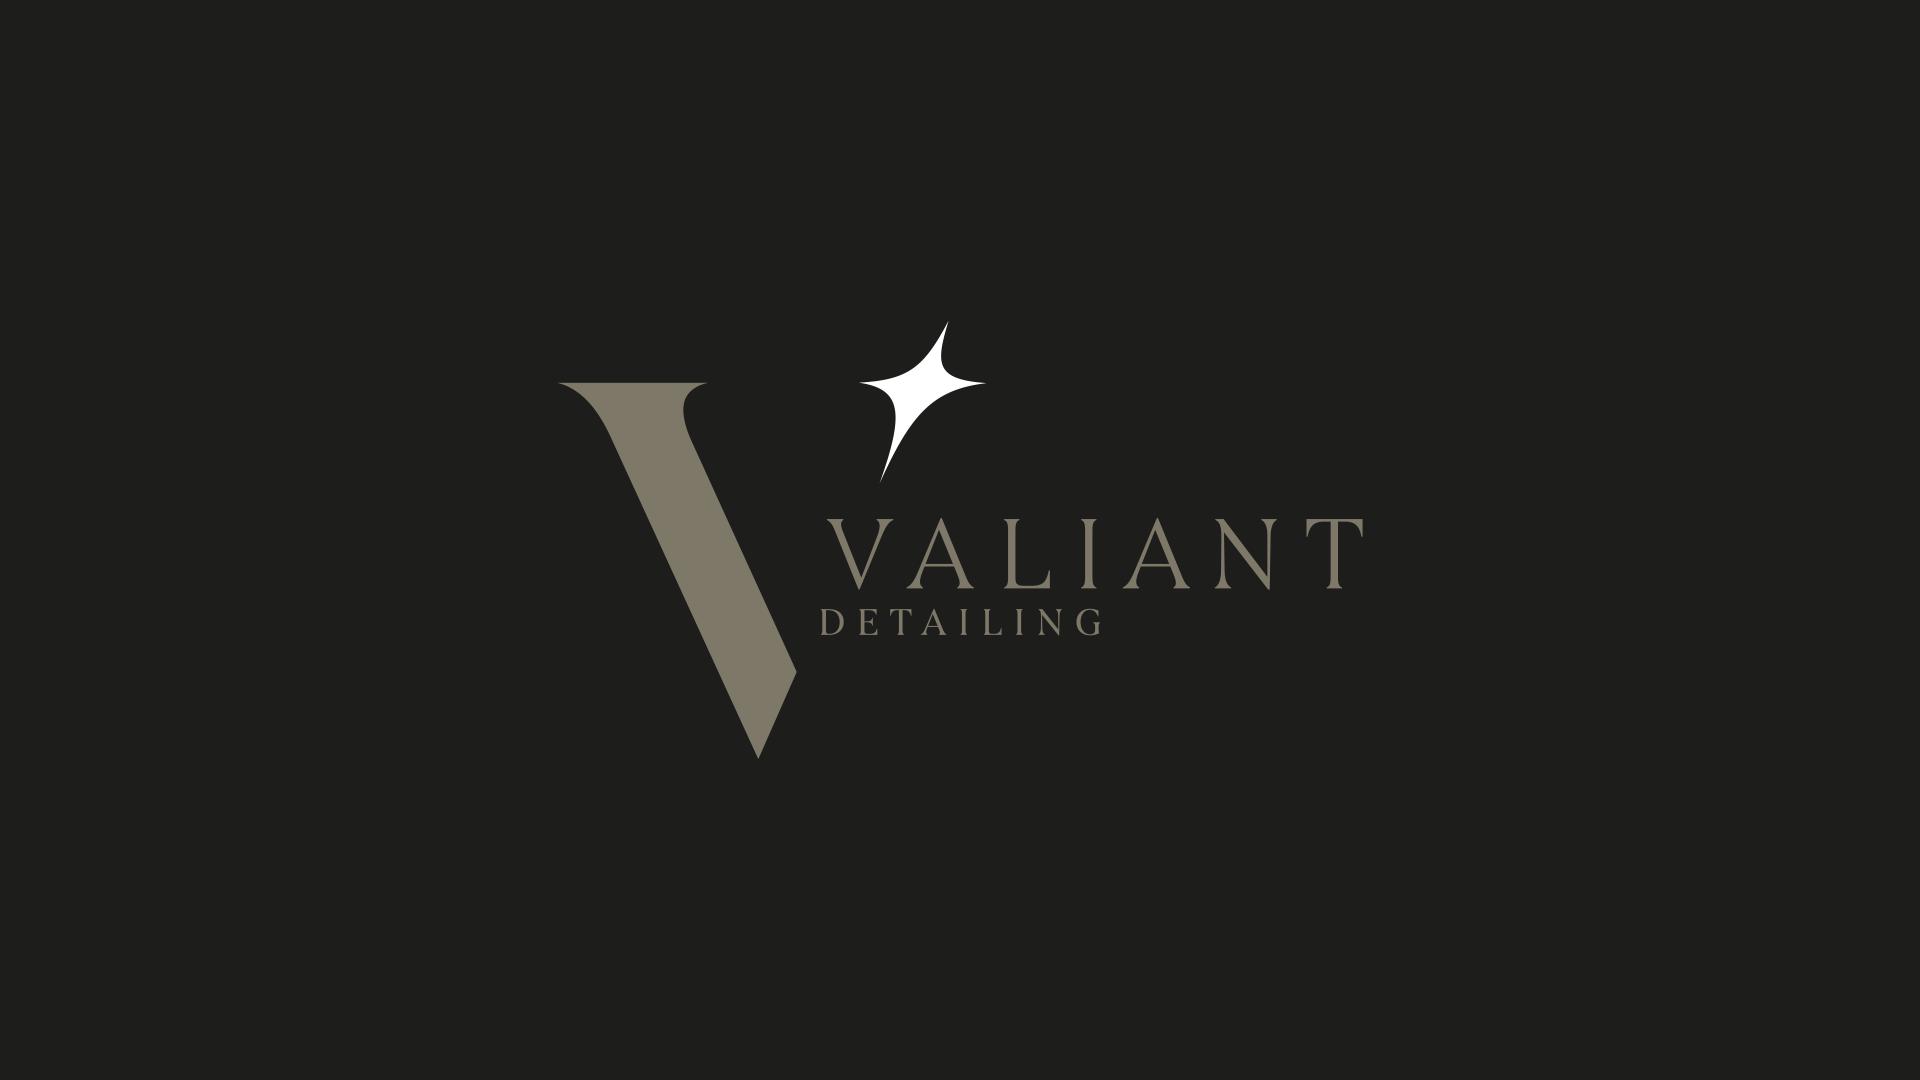 valiant detailing brand